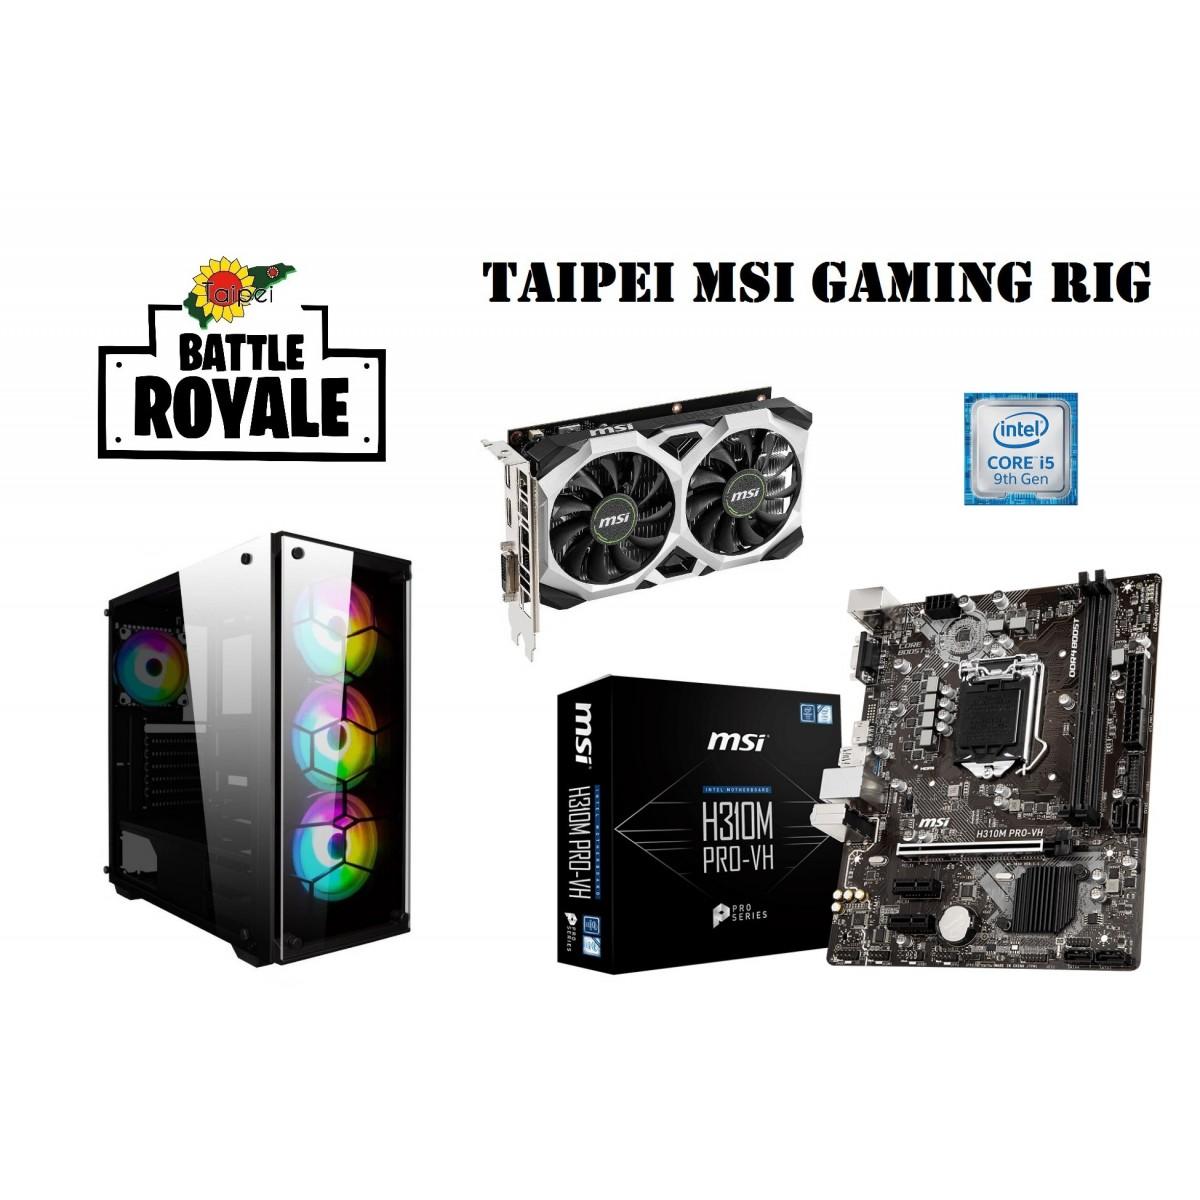 Taipei MSI Battle Royale Gaming Rig -i5